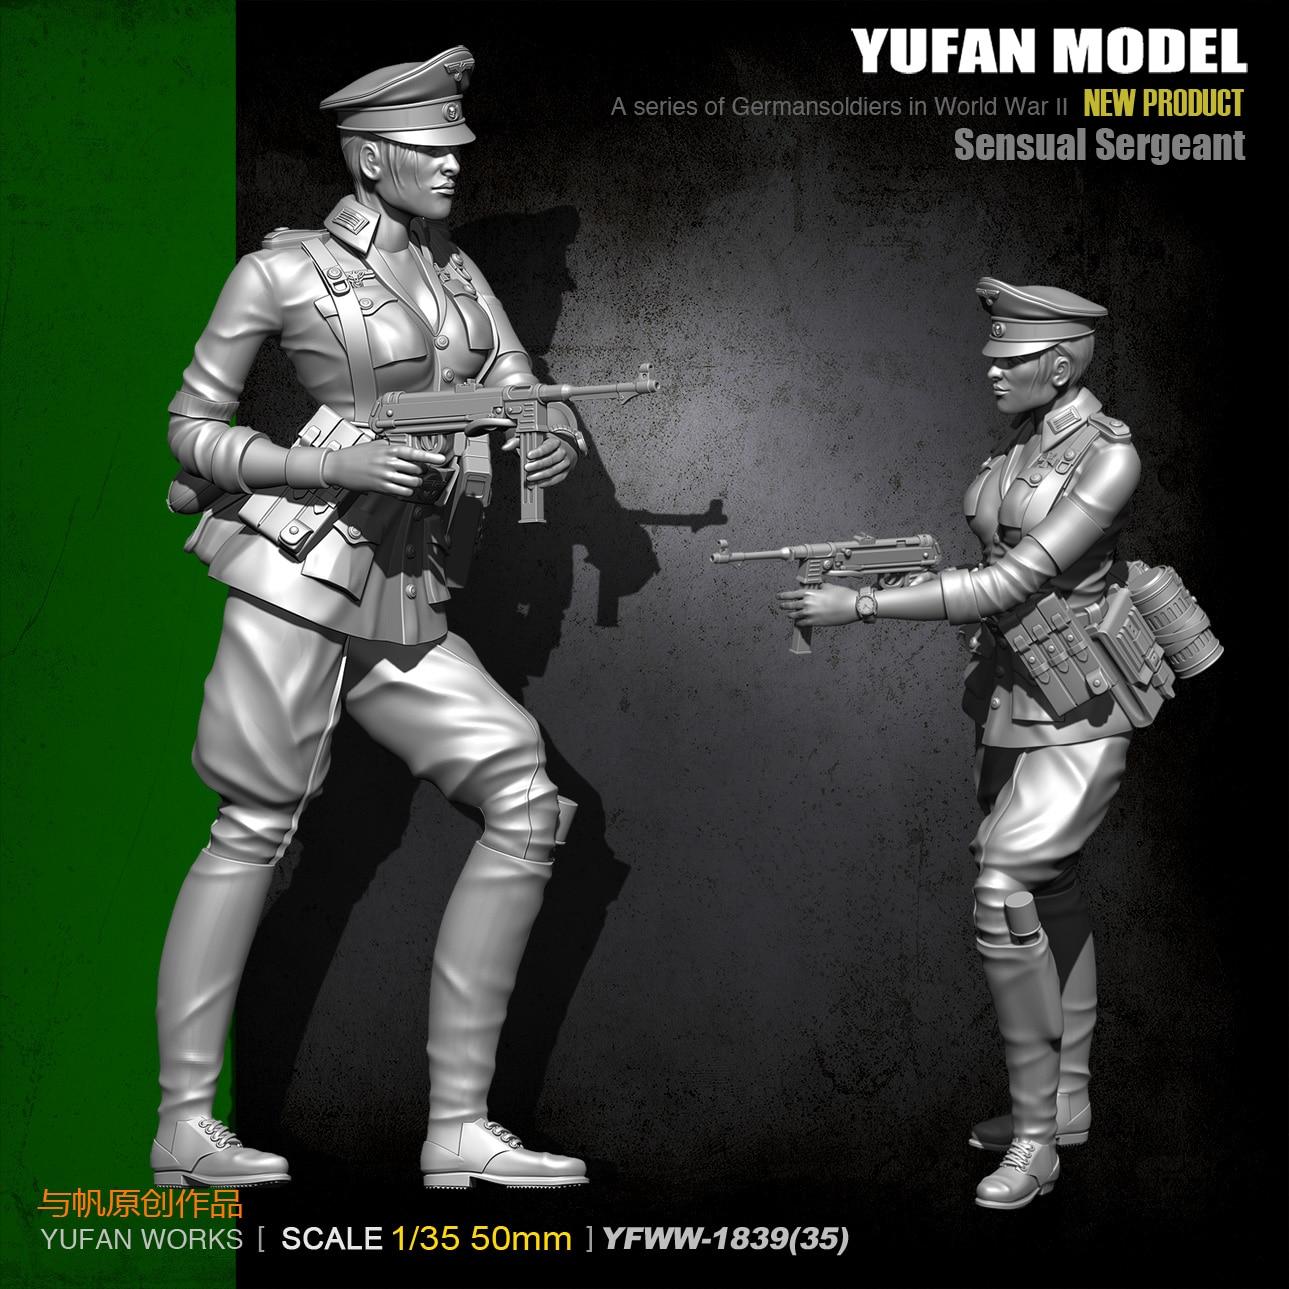 KOO 39 1//35 Beauty Women Rüstung 2 Resin Soldat Q6C7 B4F9